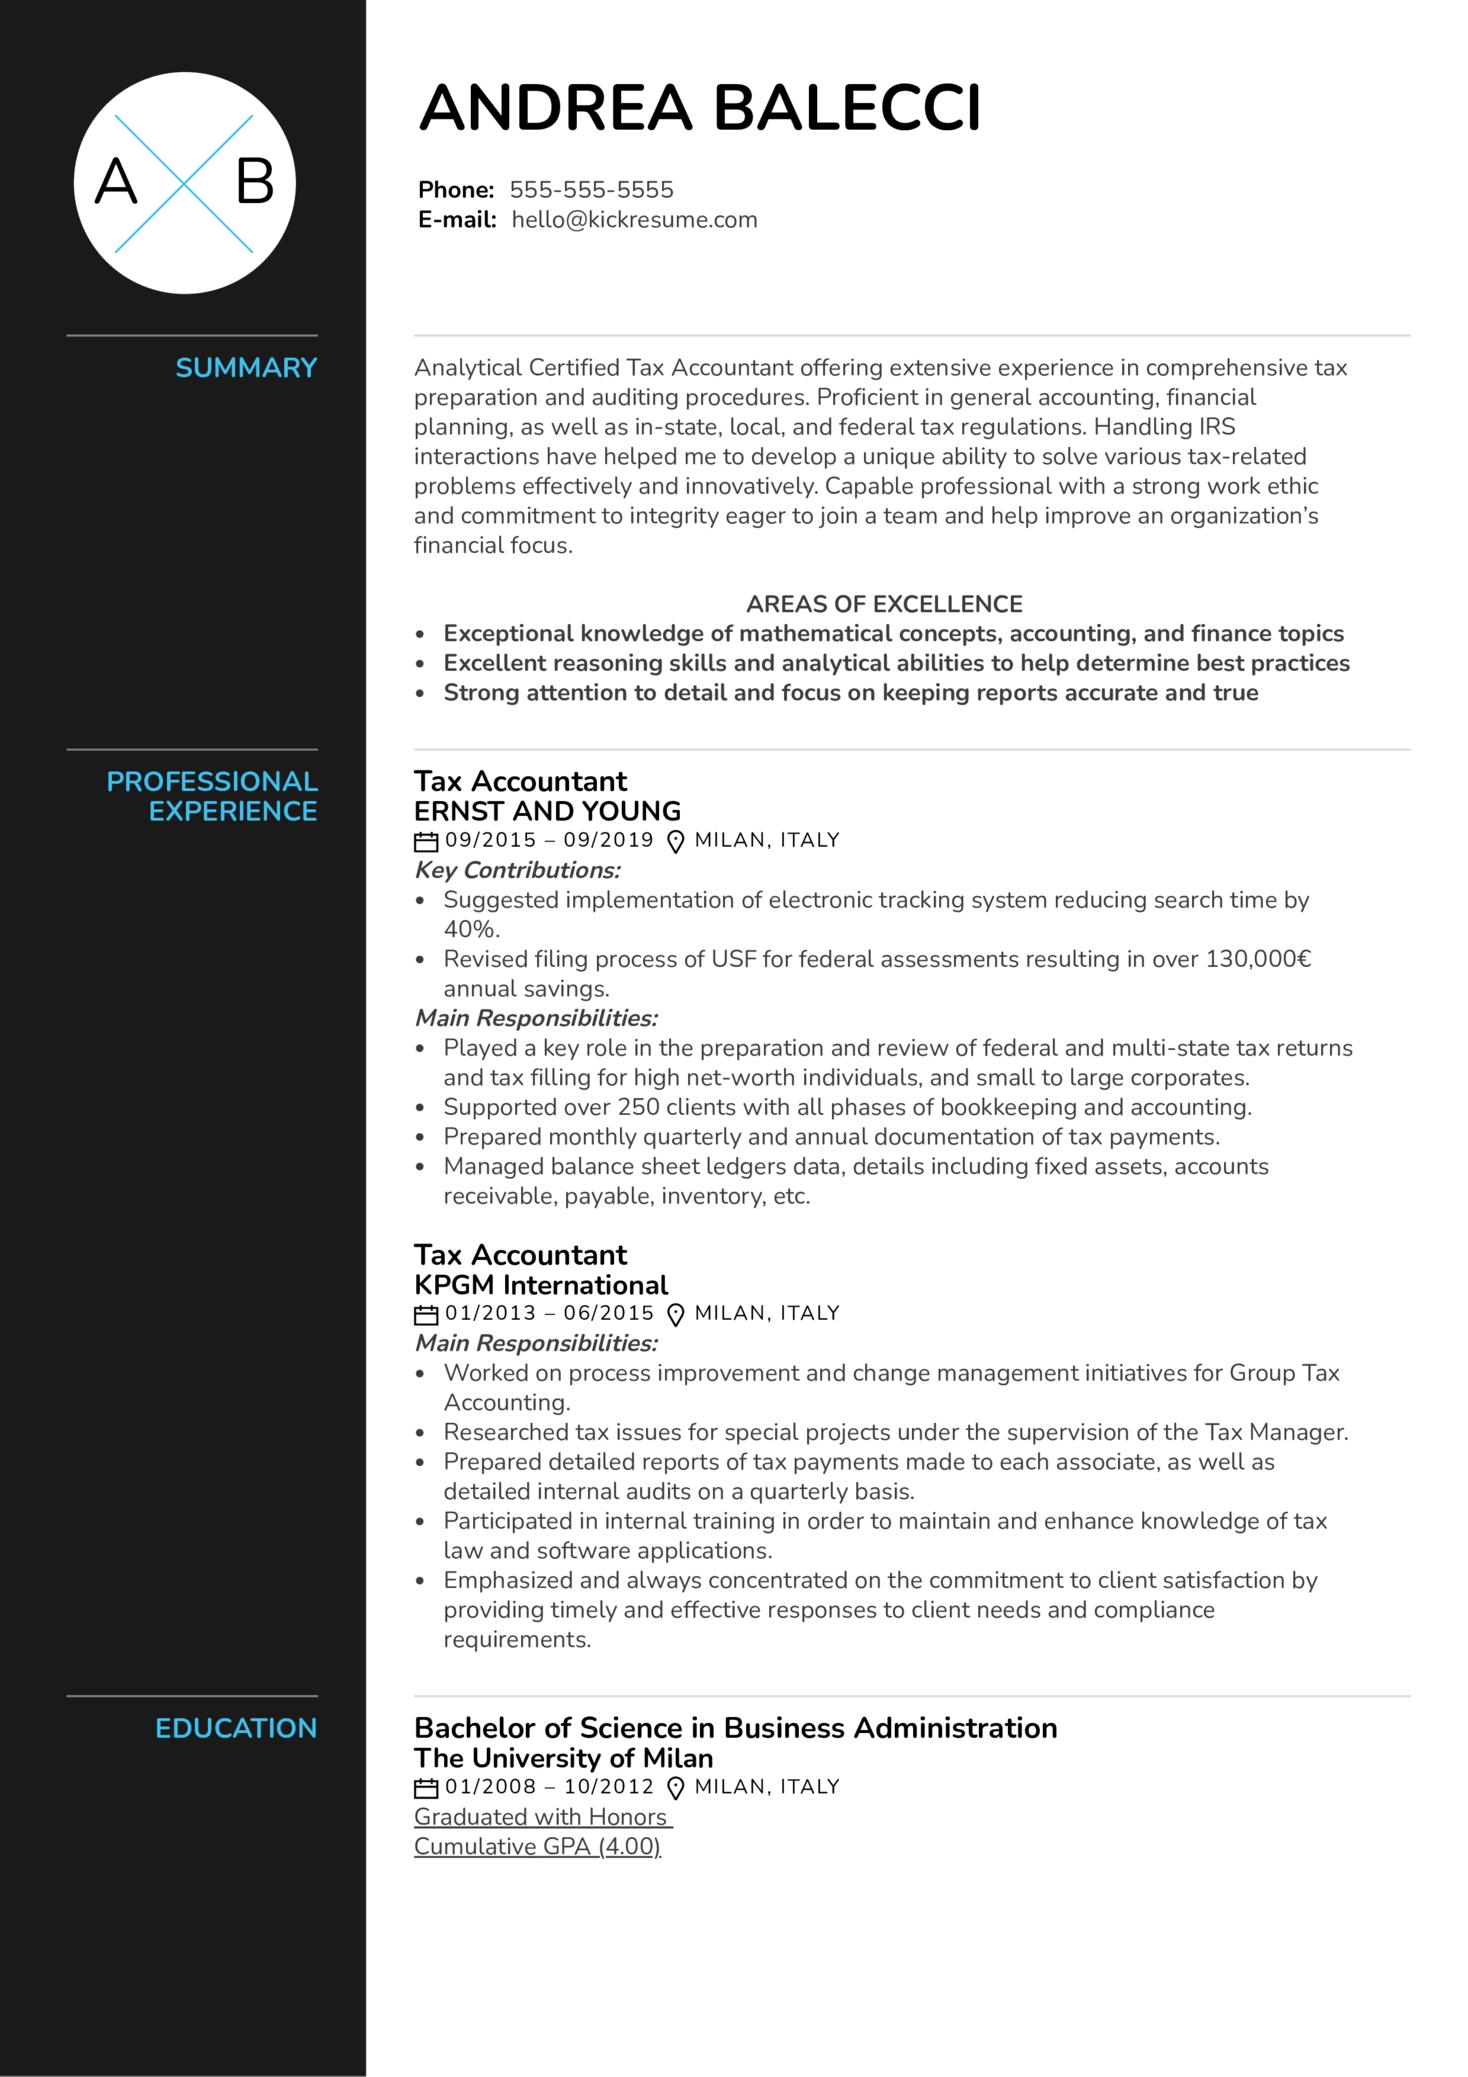 Tax Accountant Resume Sample (Teil 1)